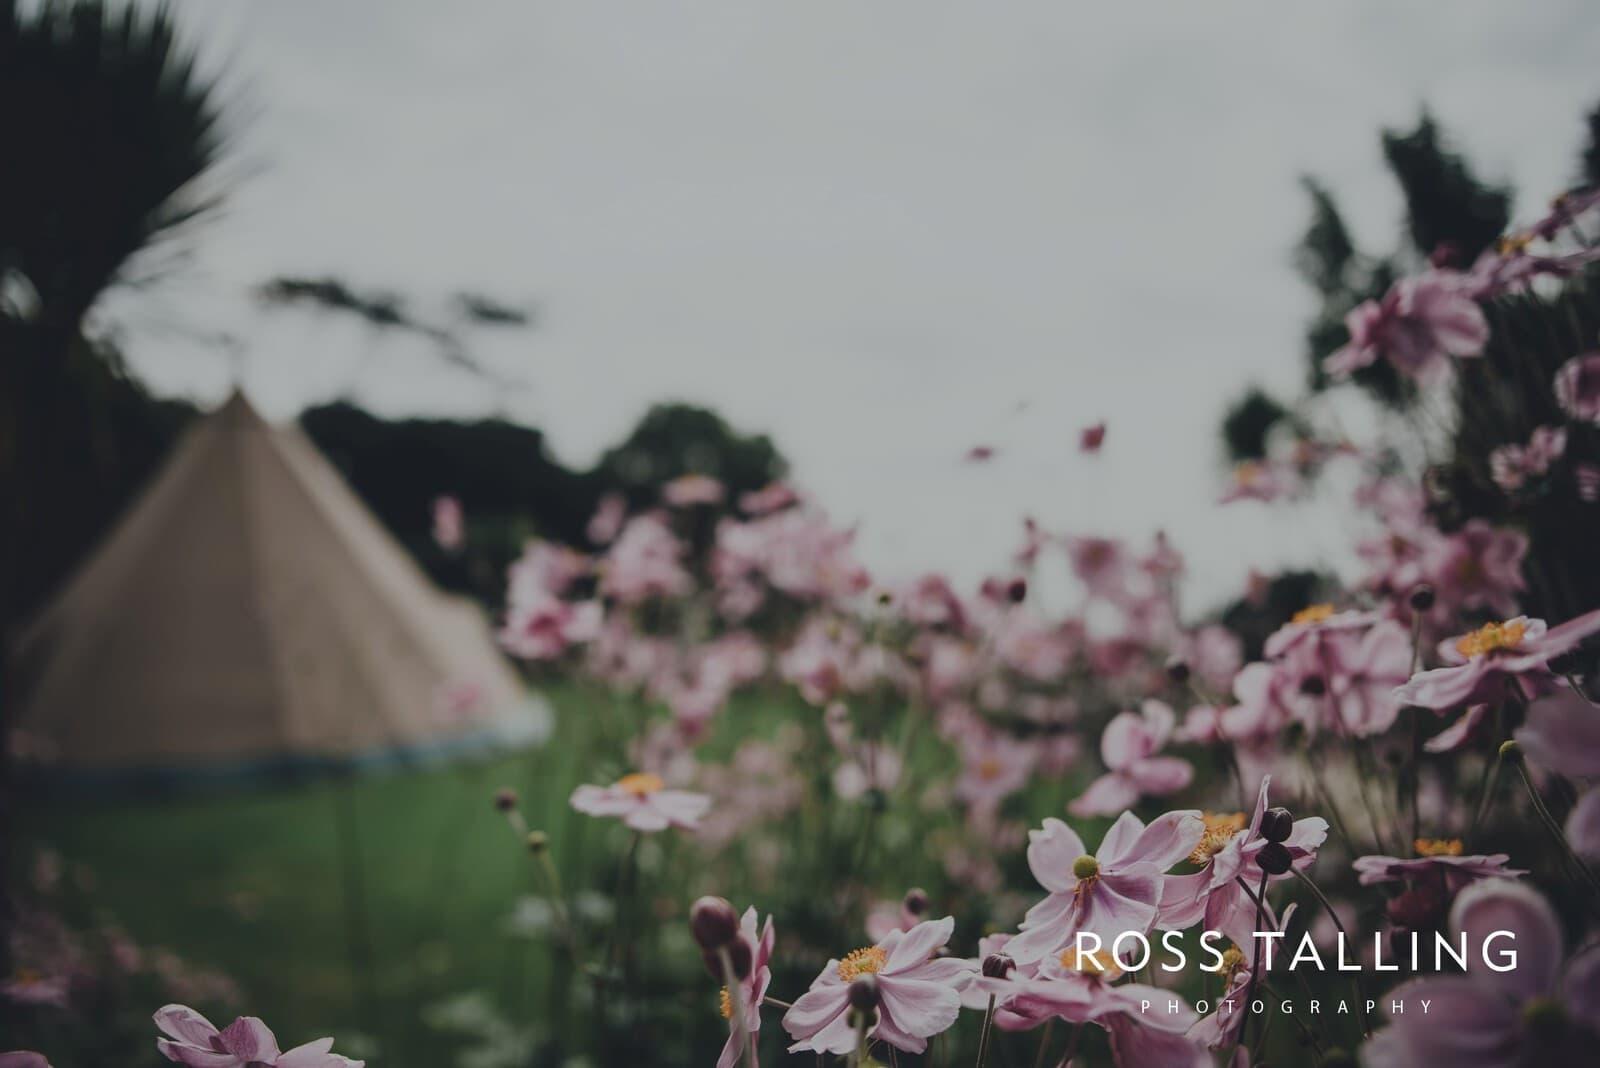 laura-matts-rosevine-hotel-wedding-photography-cornwall_0000